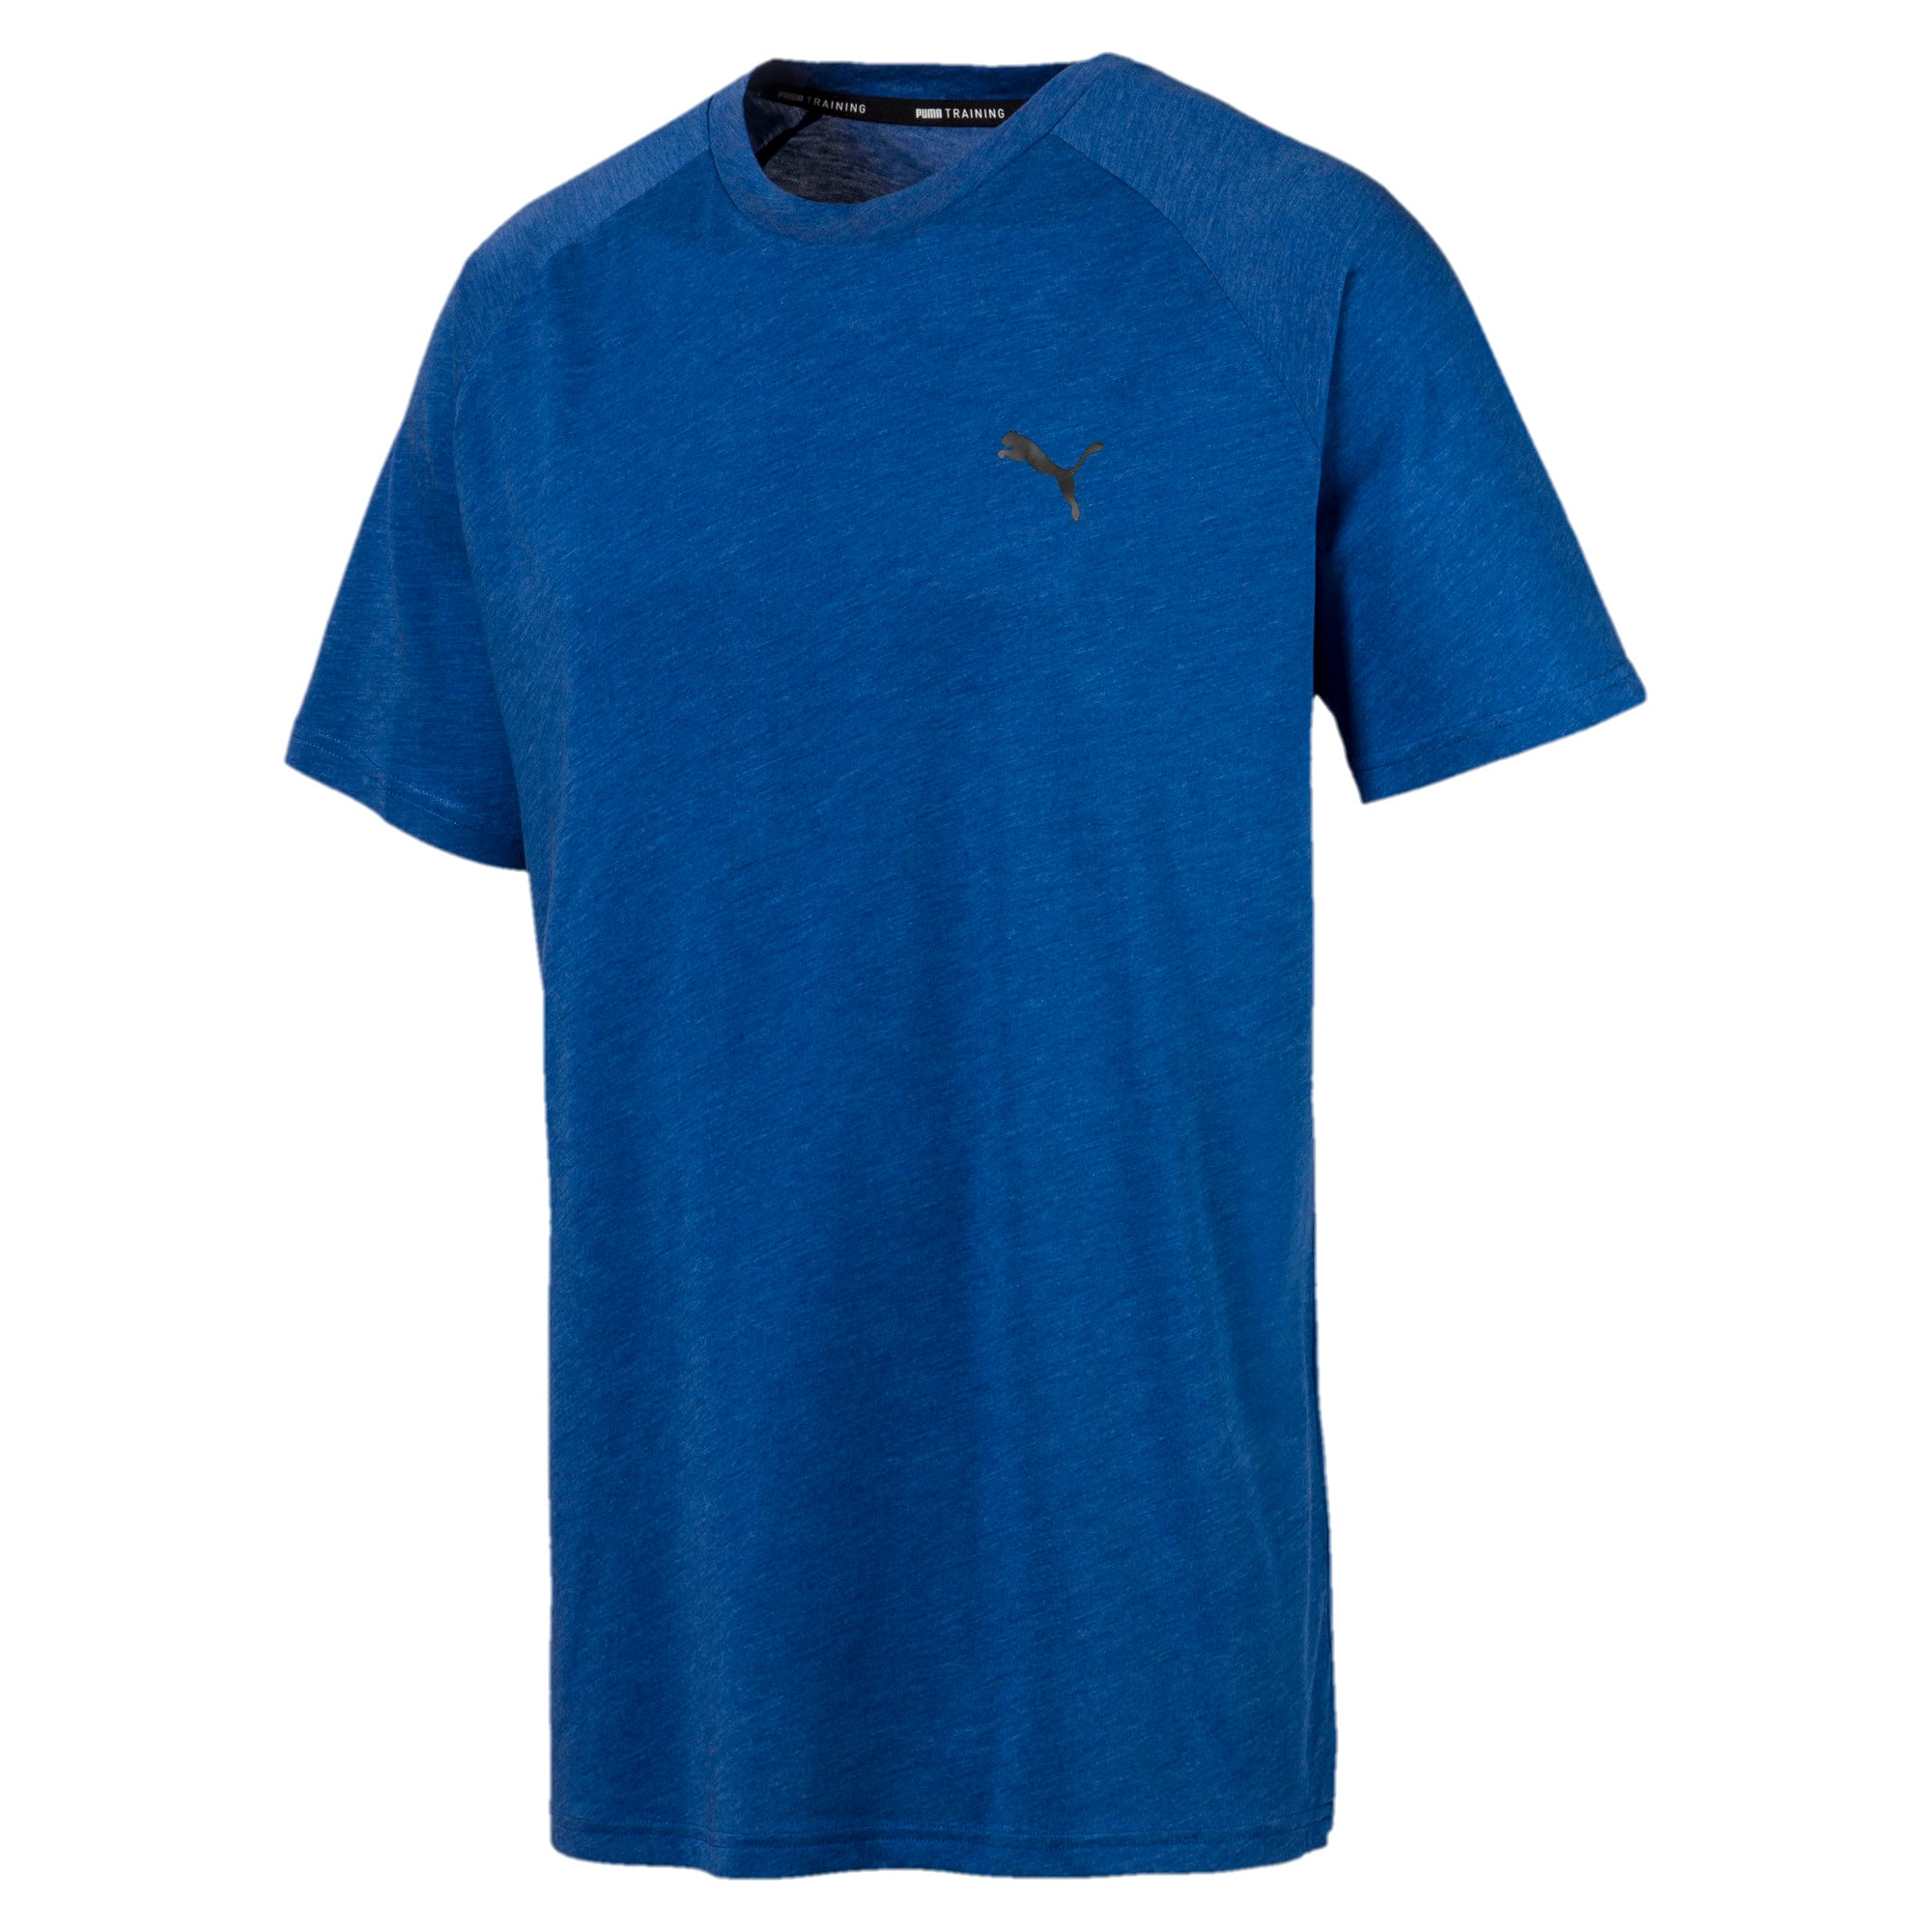 Thumbnail 4 of T-Shirt Reactive pour homme, Galaxy Blue Heather, medium